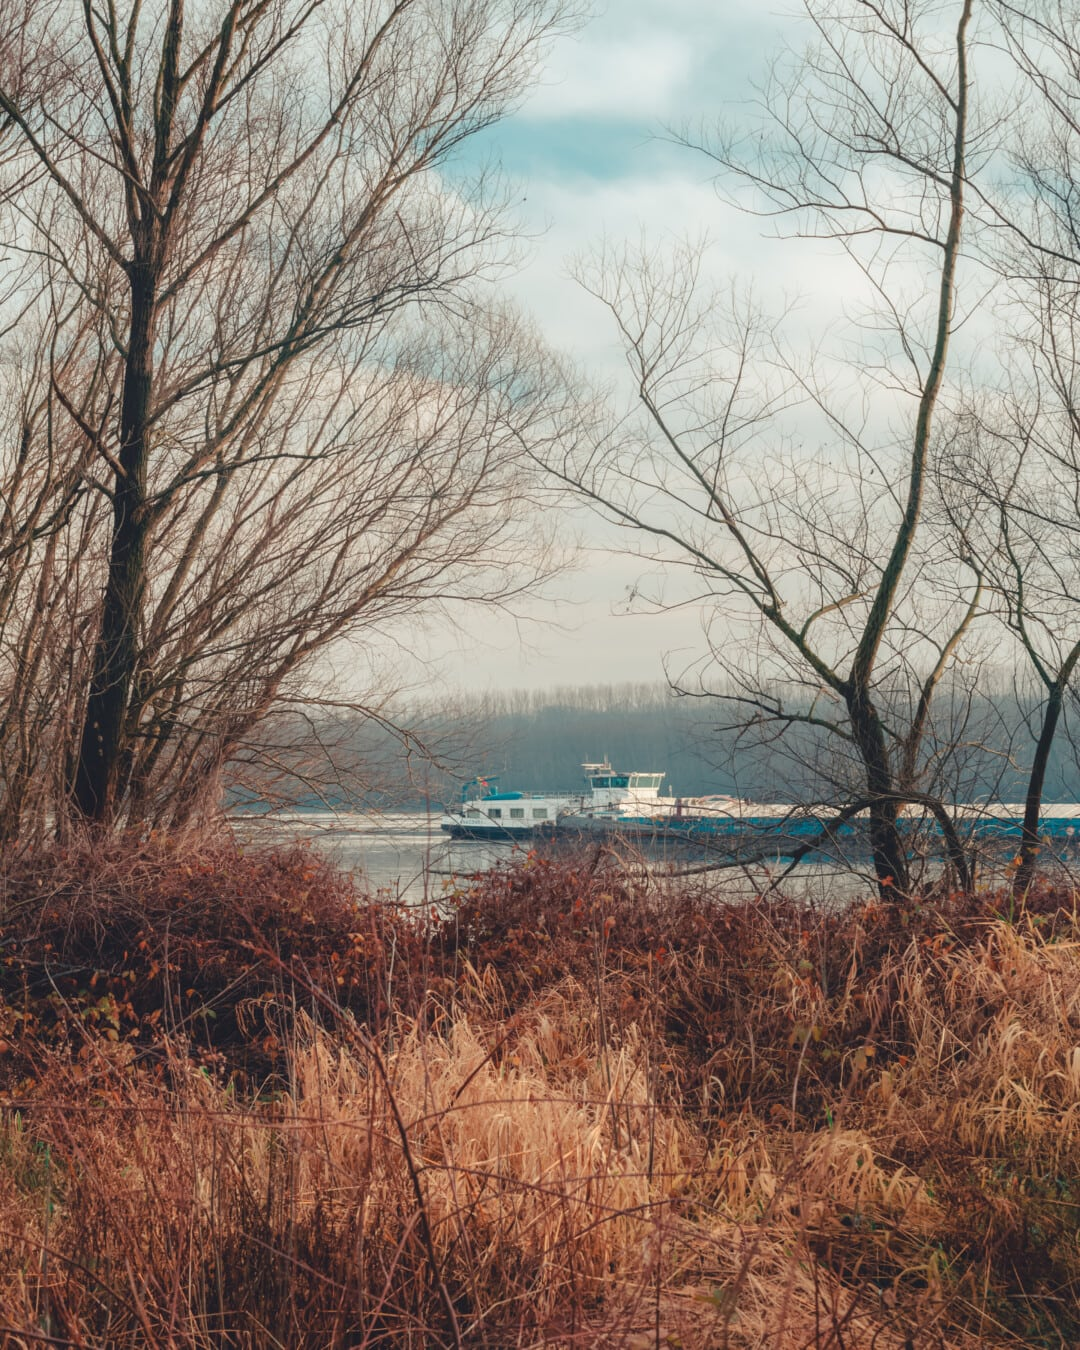 barge, autumn season, riverbank, cargo ship, foggy, trees, tree, landscape, nature, dawn